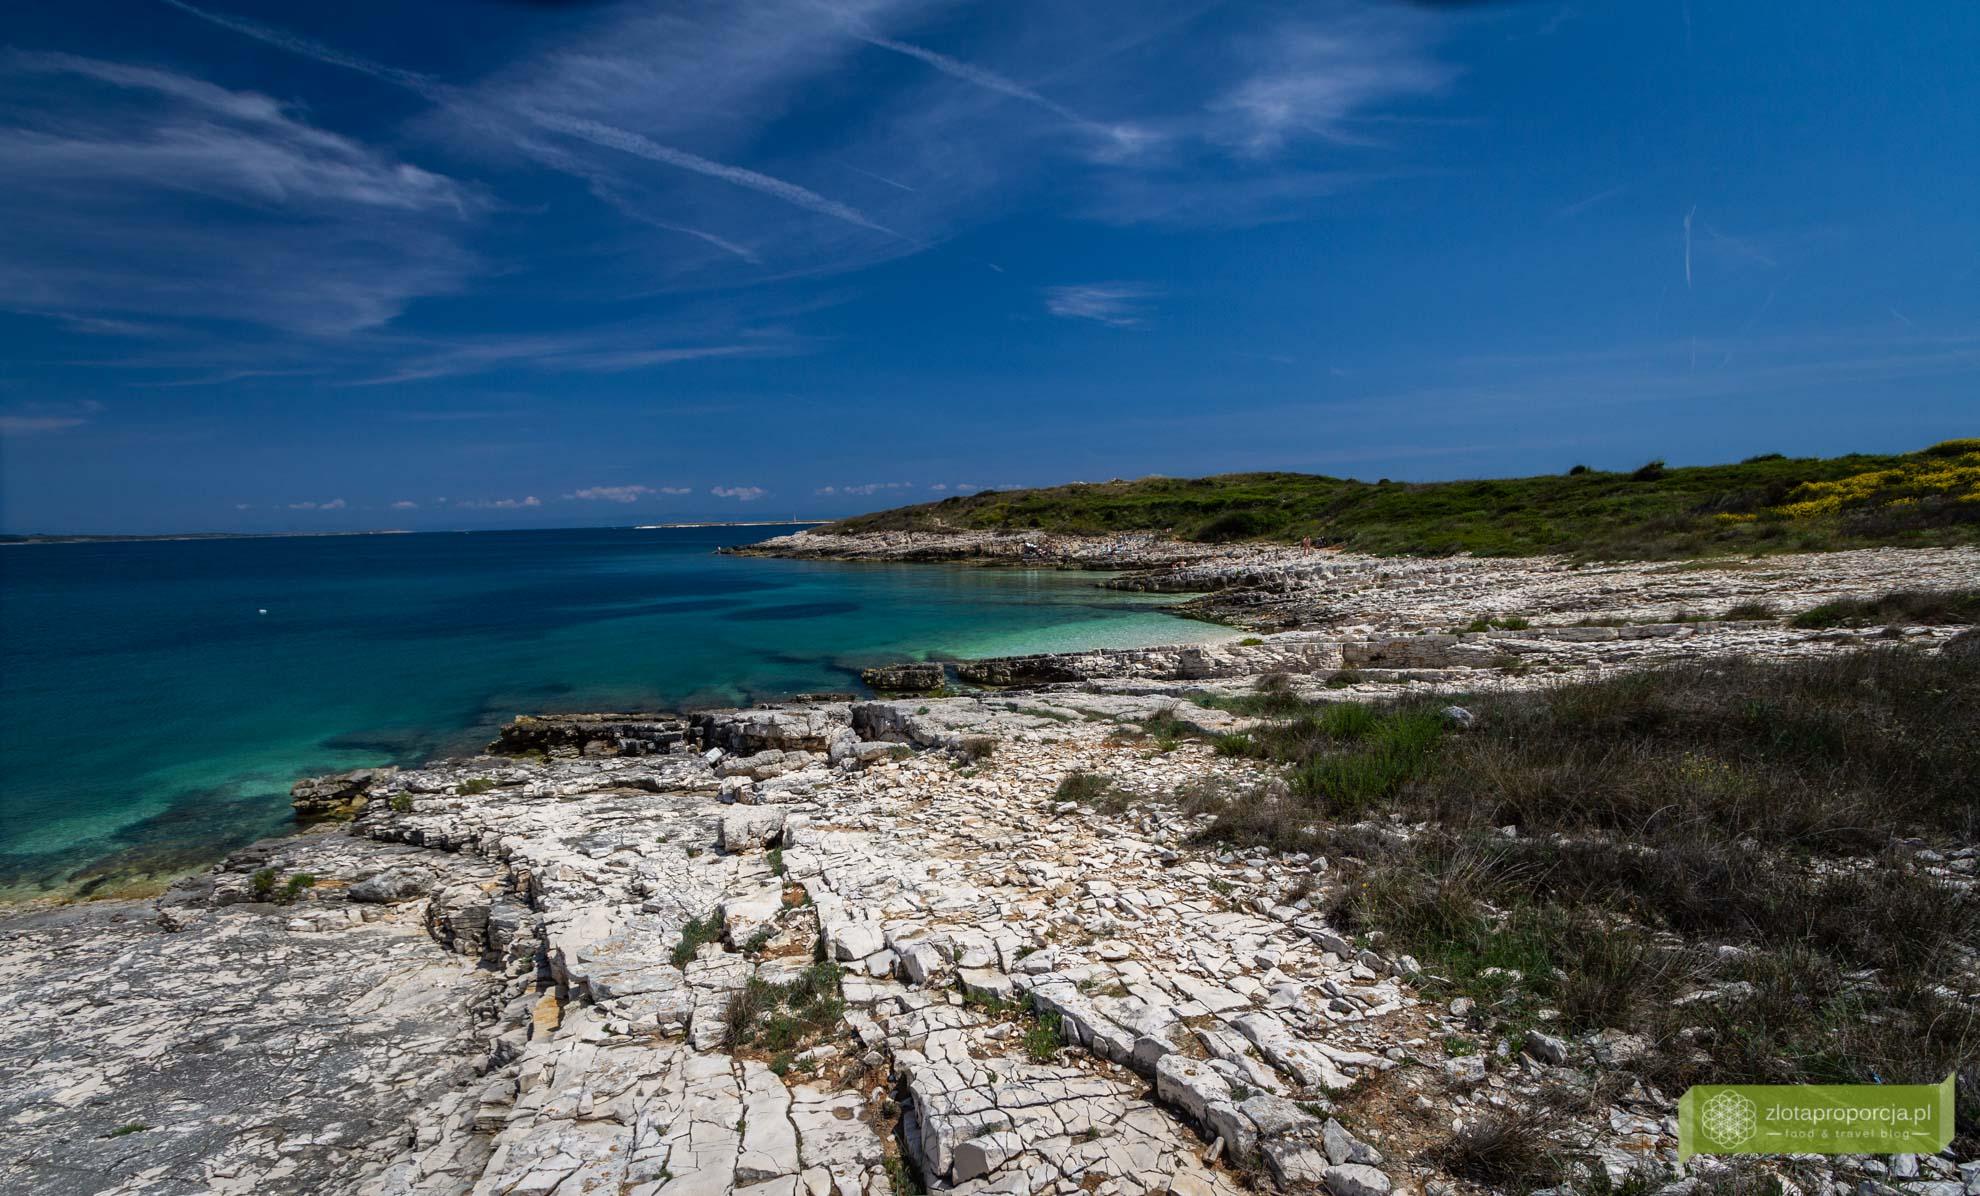 przylądek Kamenjak; Kamenjak; Istria; Chorwacja; plaże Istrii; Prematura; Kamenjak plaża; Kamenjak wjazd; Kamenjak nocleg;